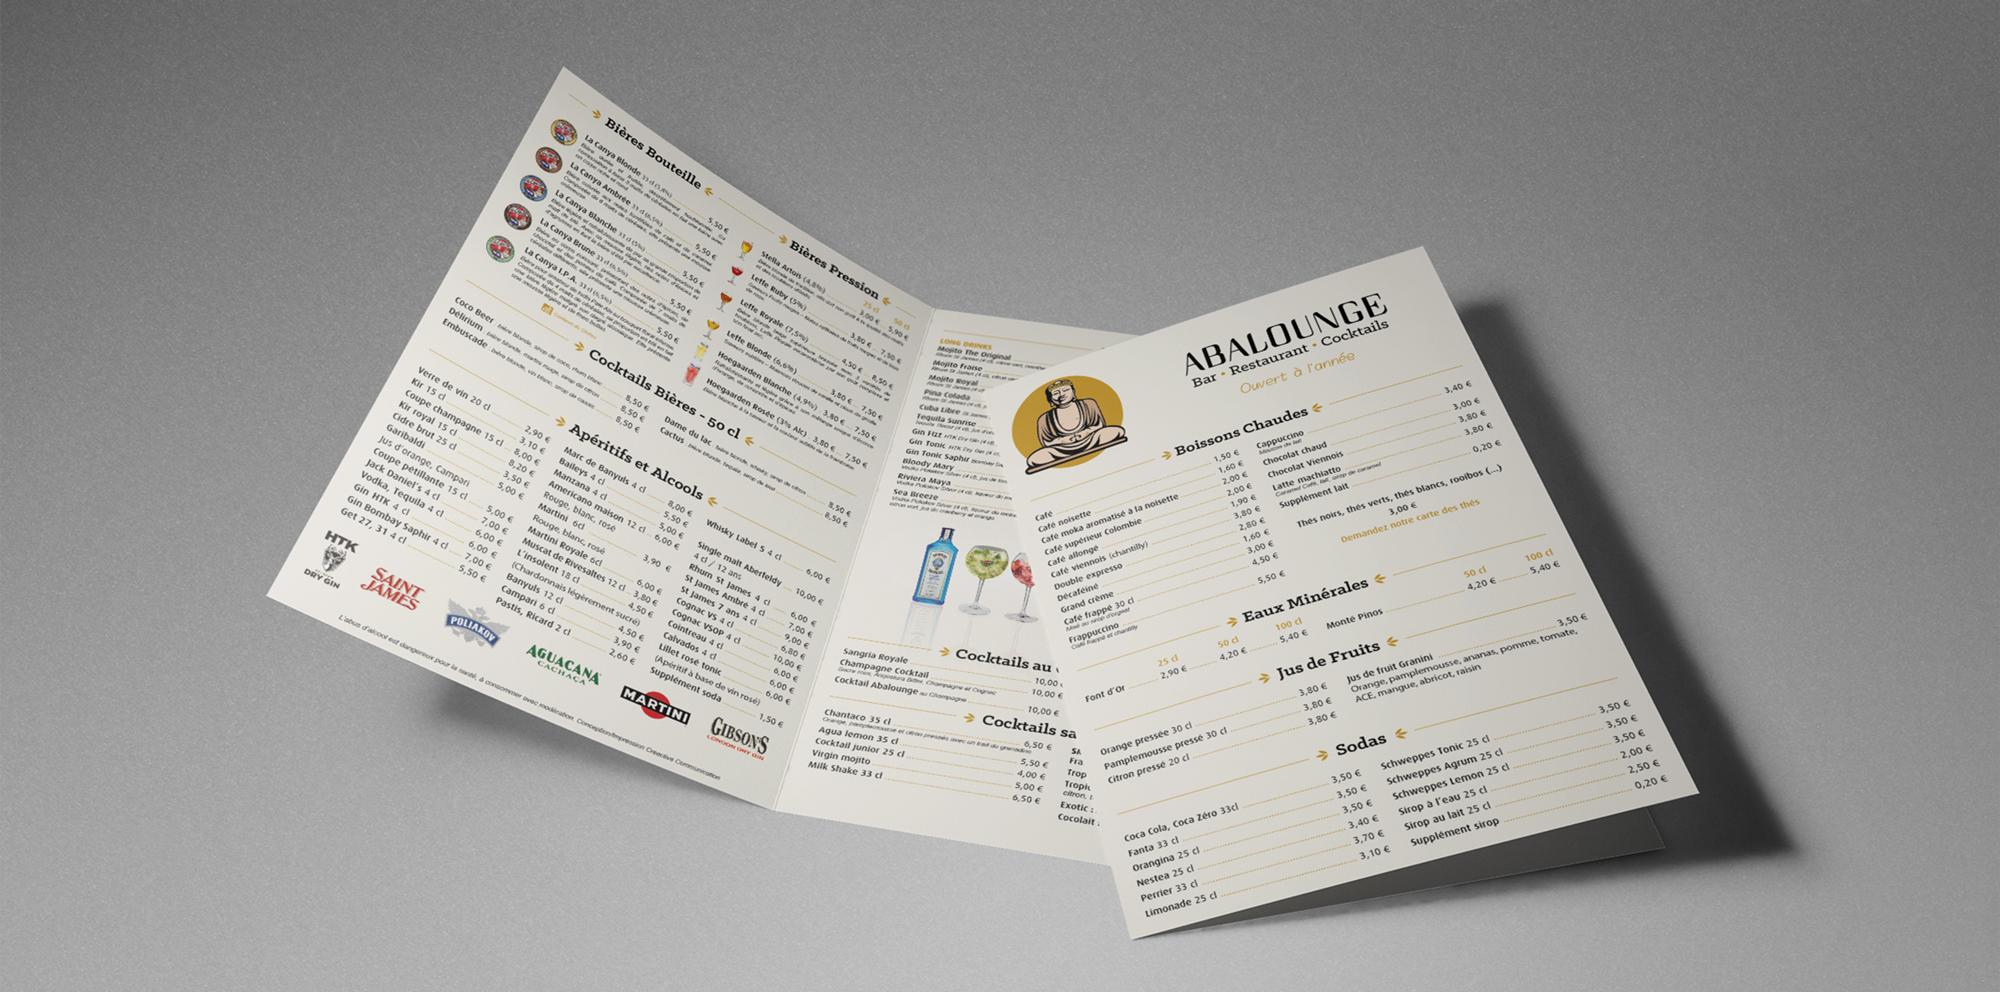 Depliant-Abalounge-Mockup